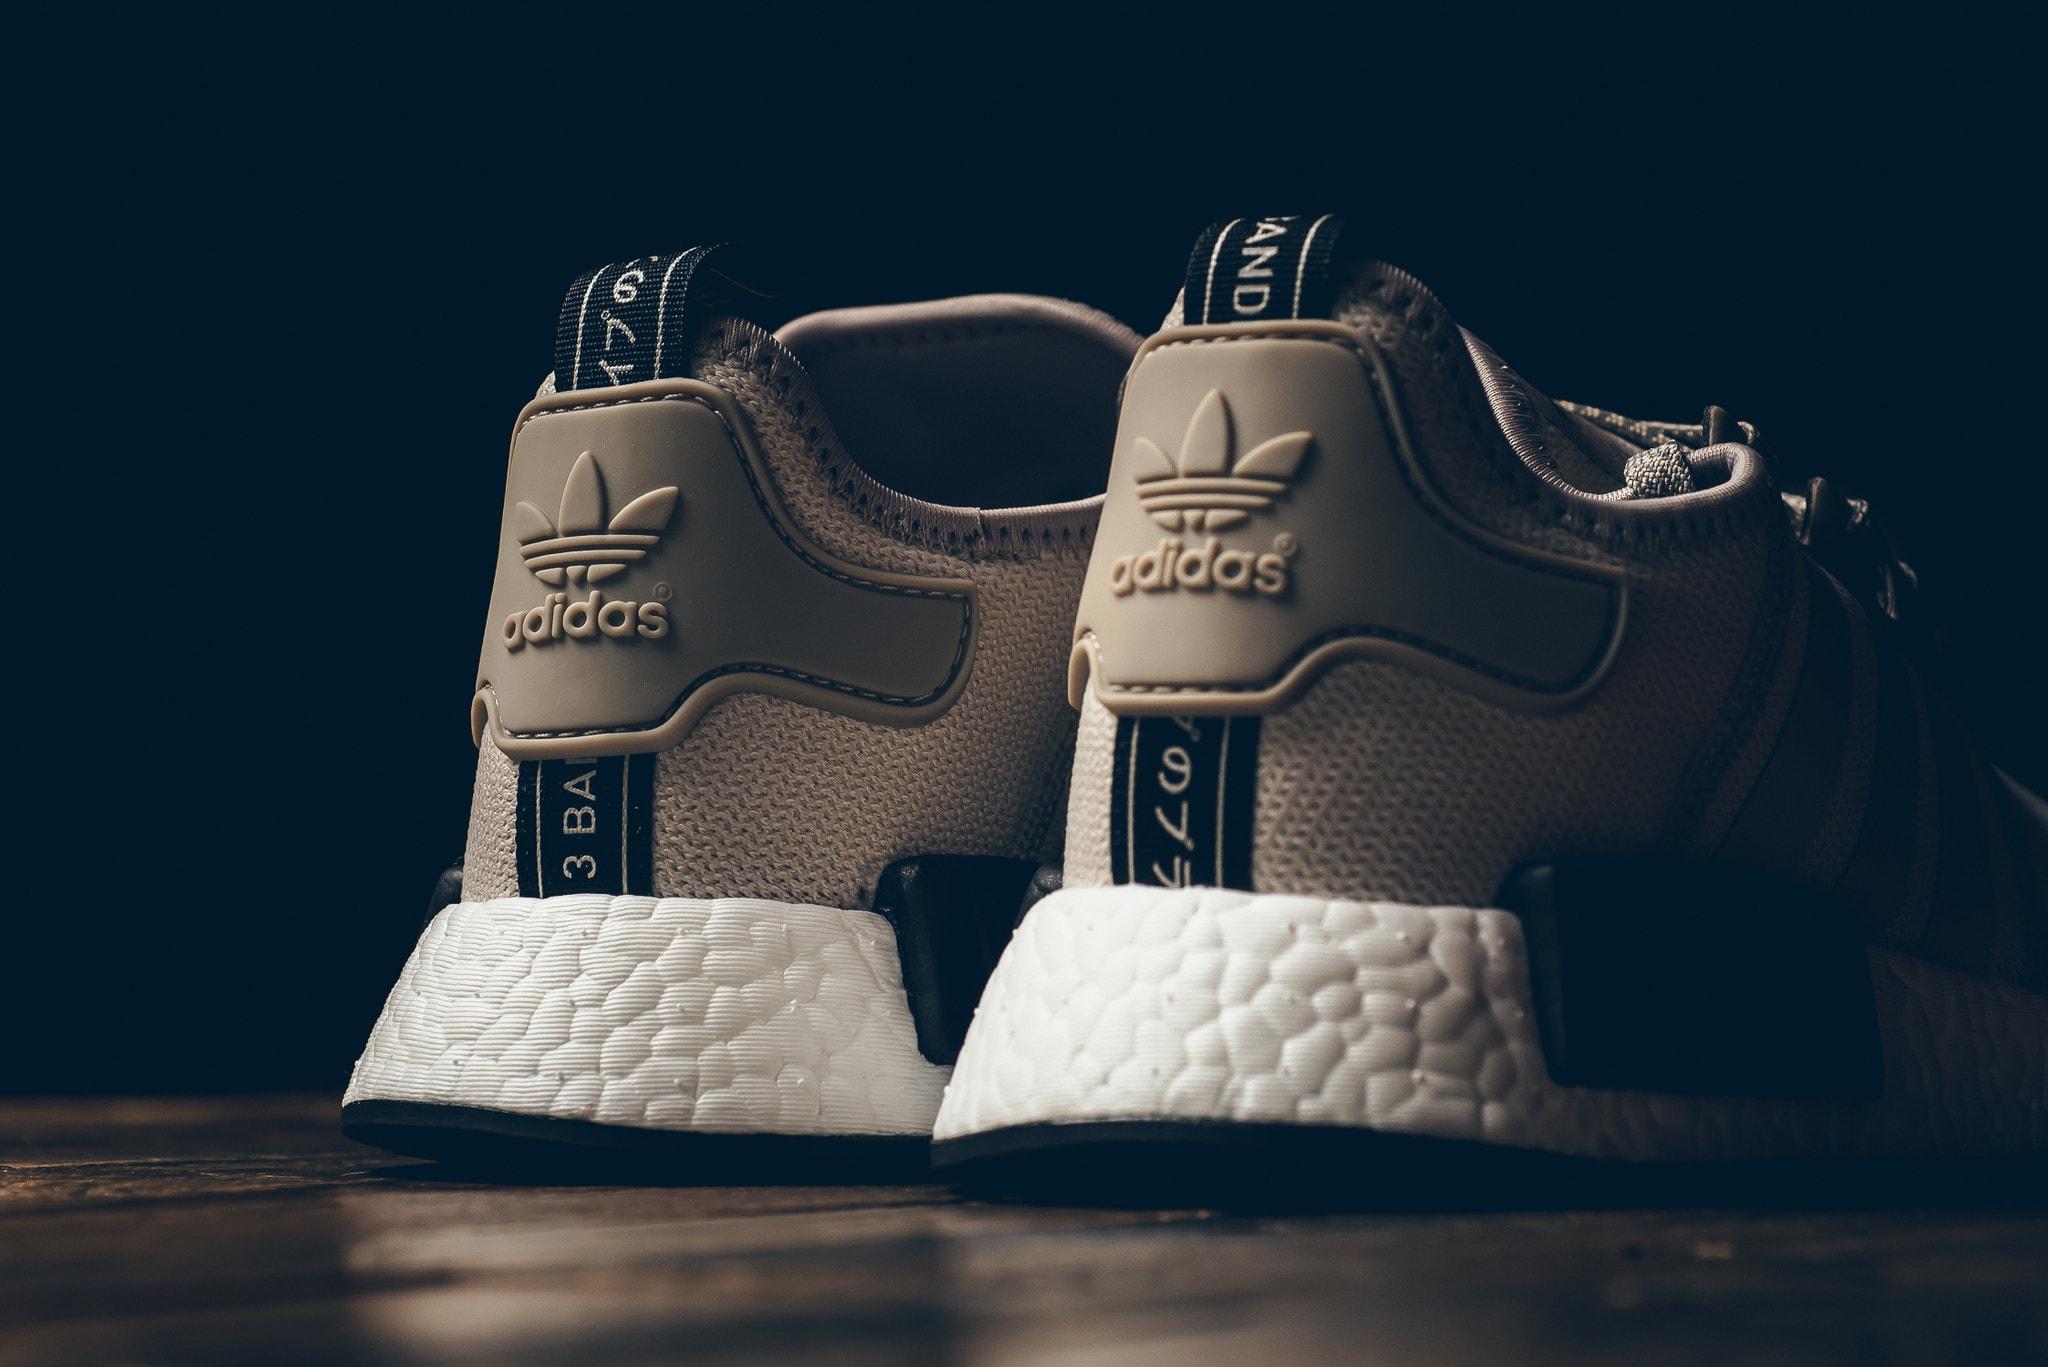 e24b1b5b67326 Adidas NMD R1 Khaki Release Date Heel S76848